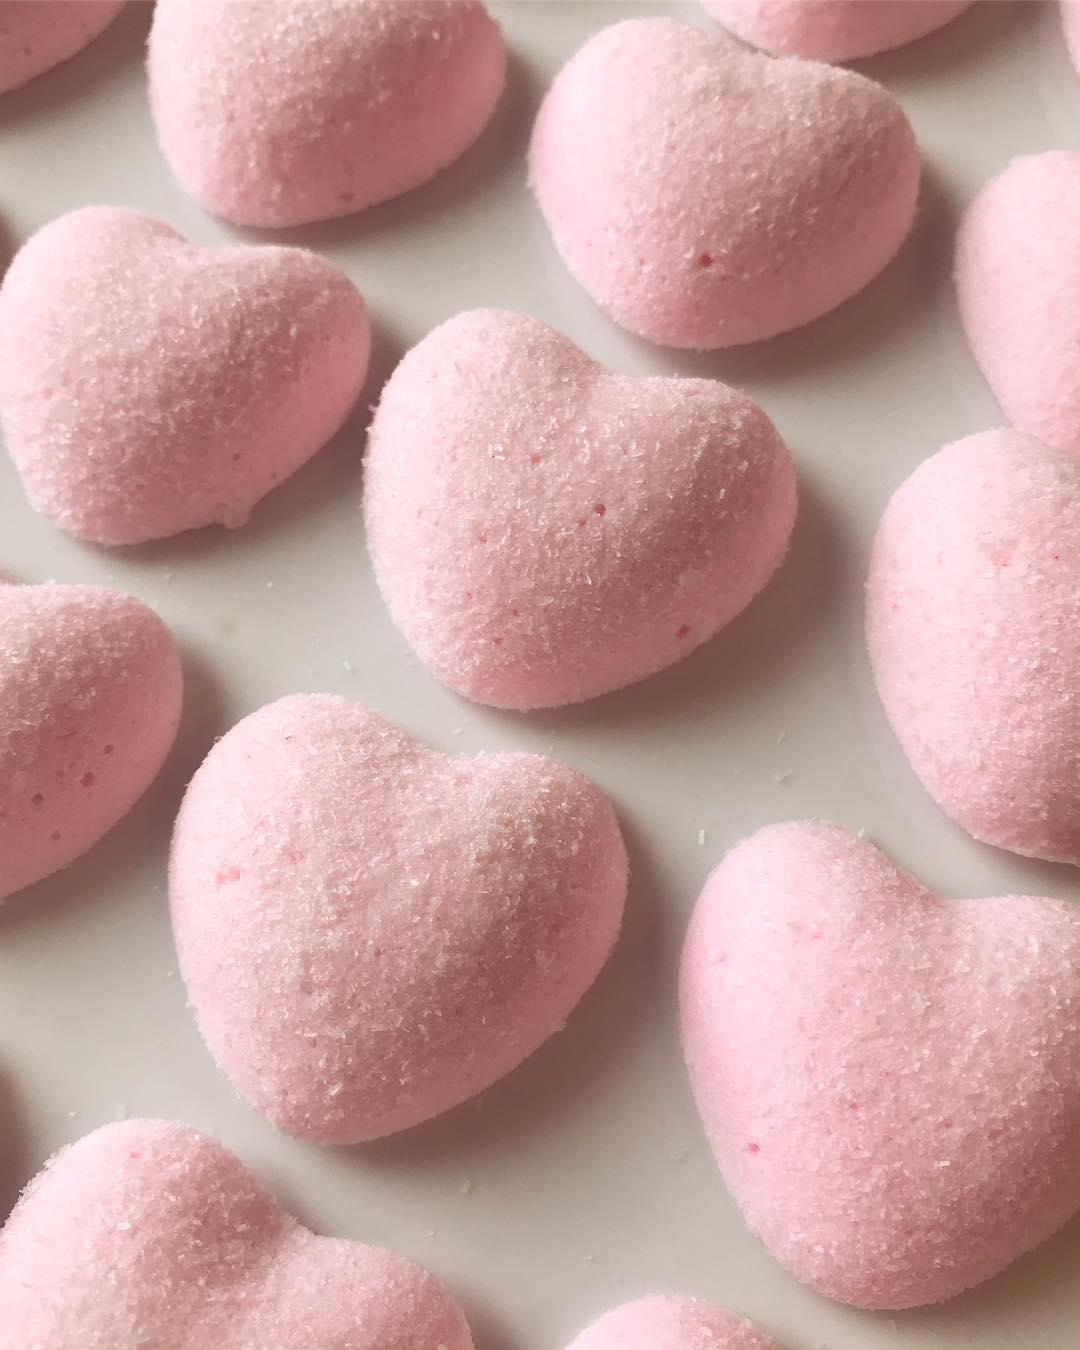 nadege valentine's day